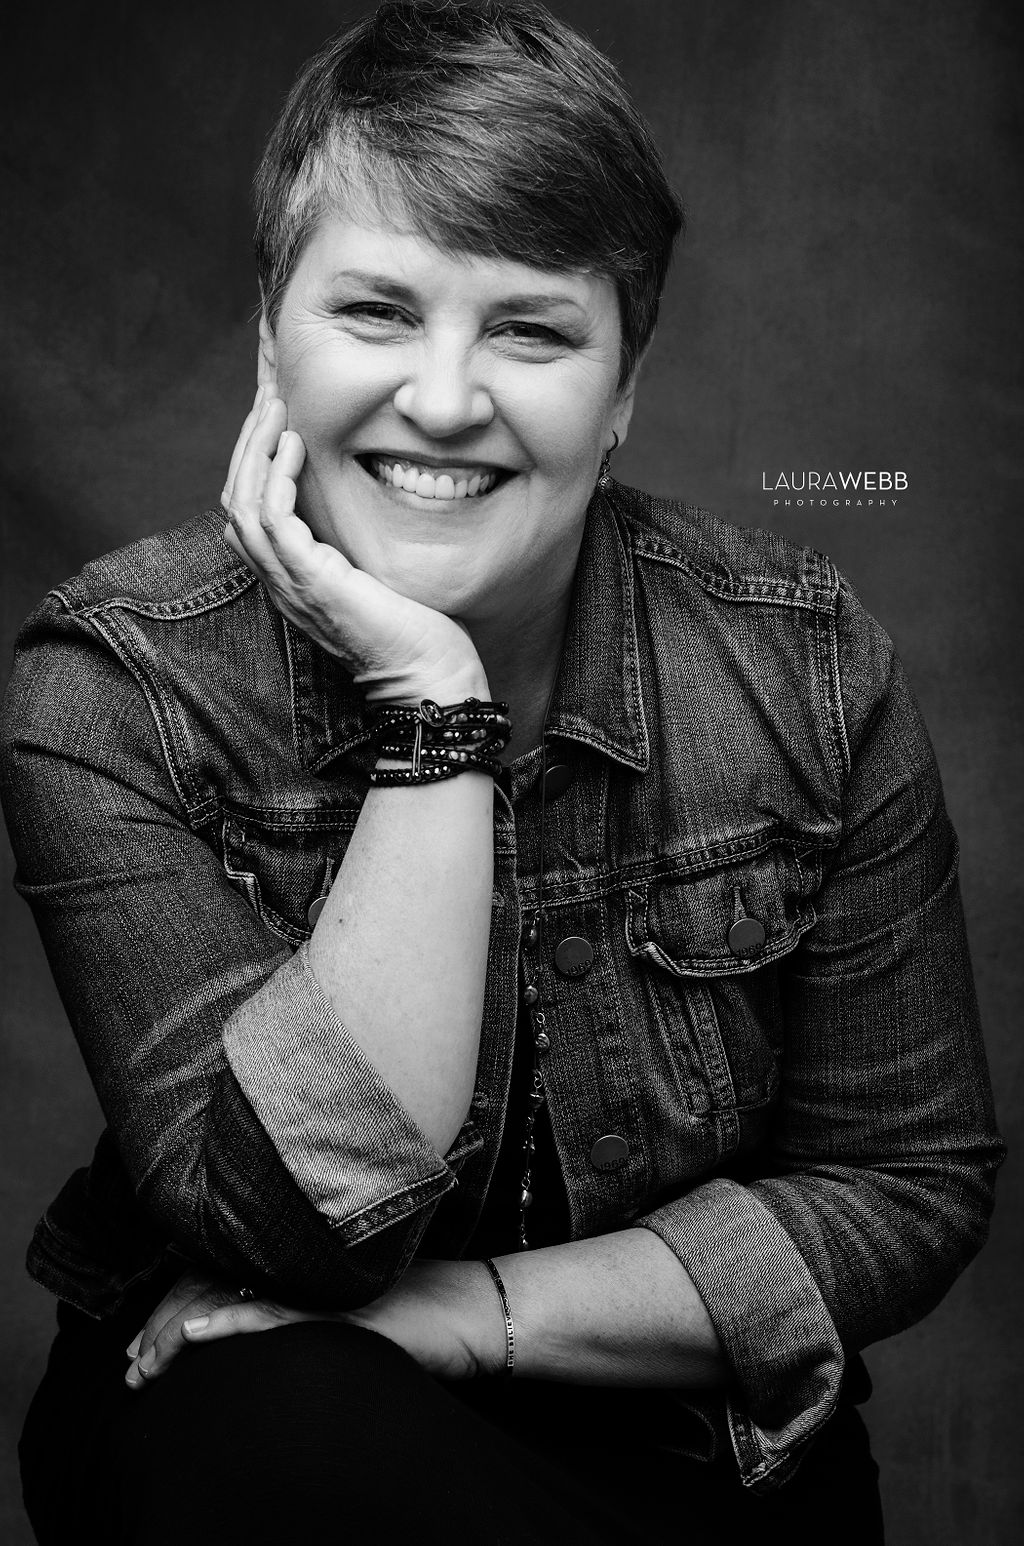 Photography: Laura Webb Photography